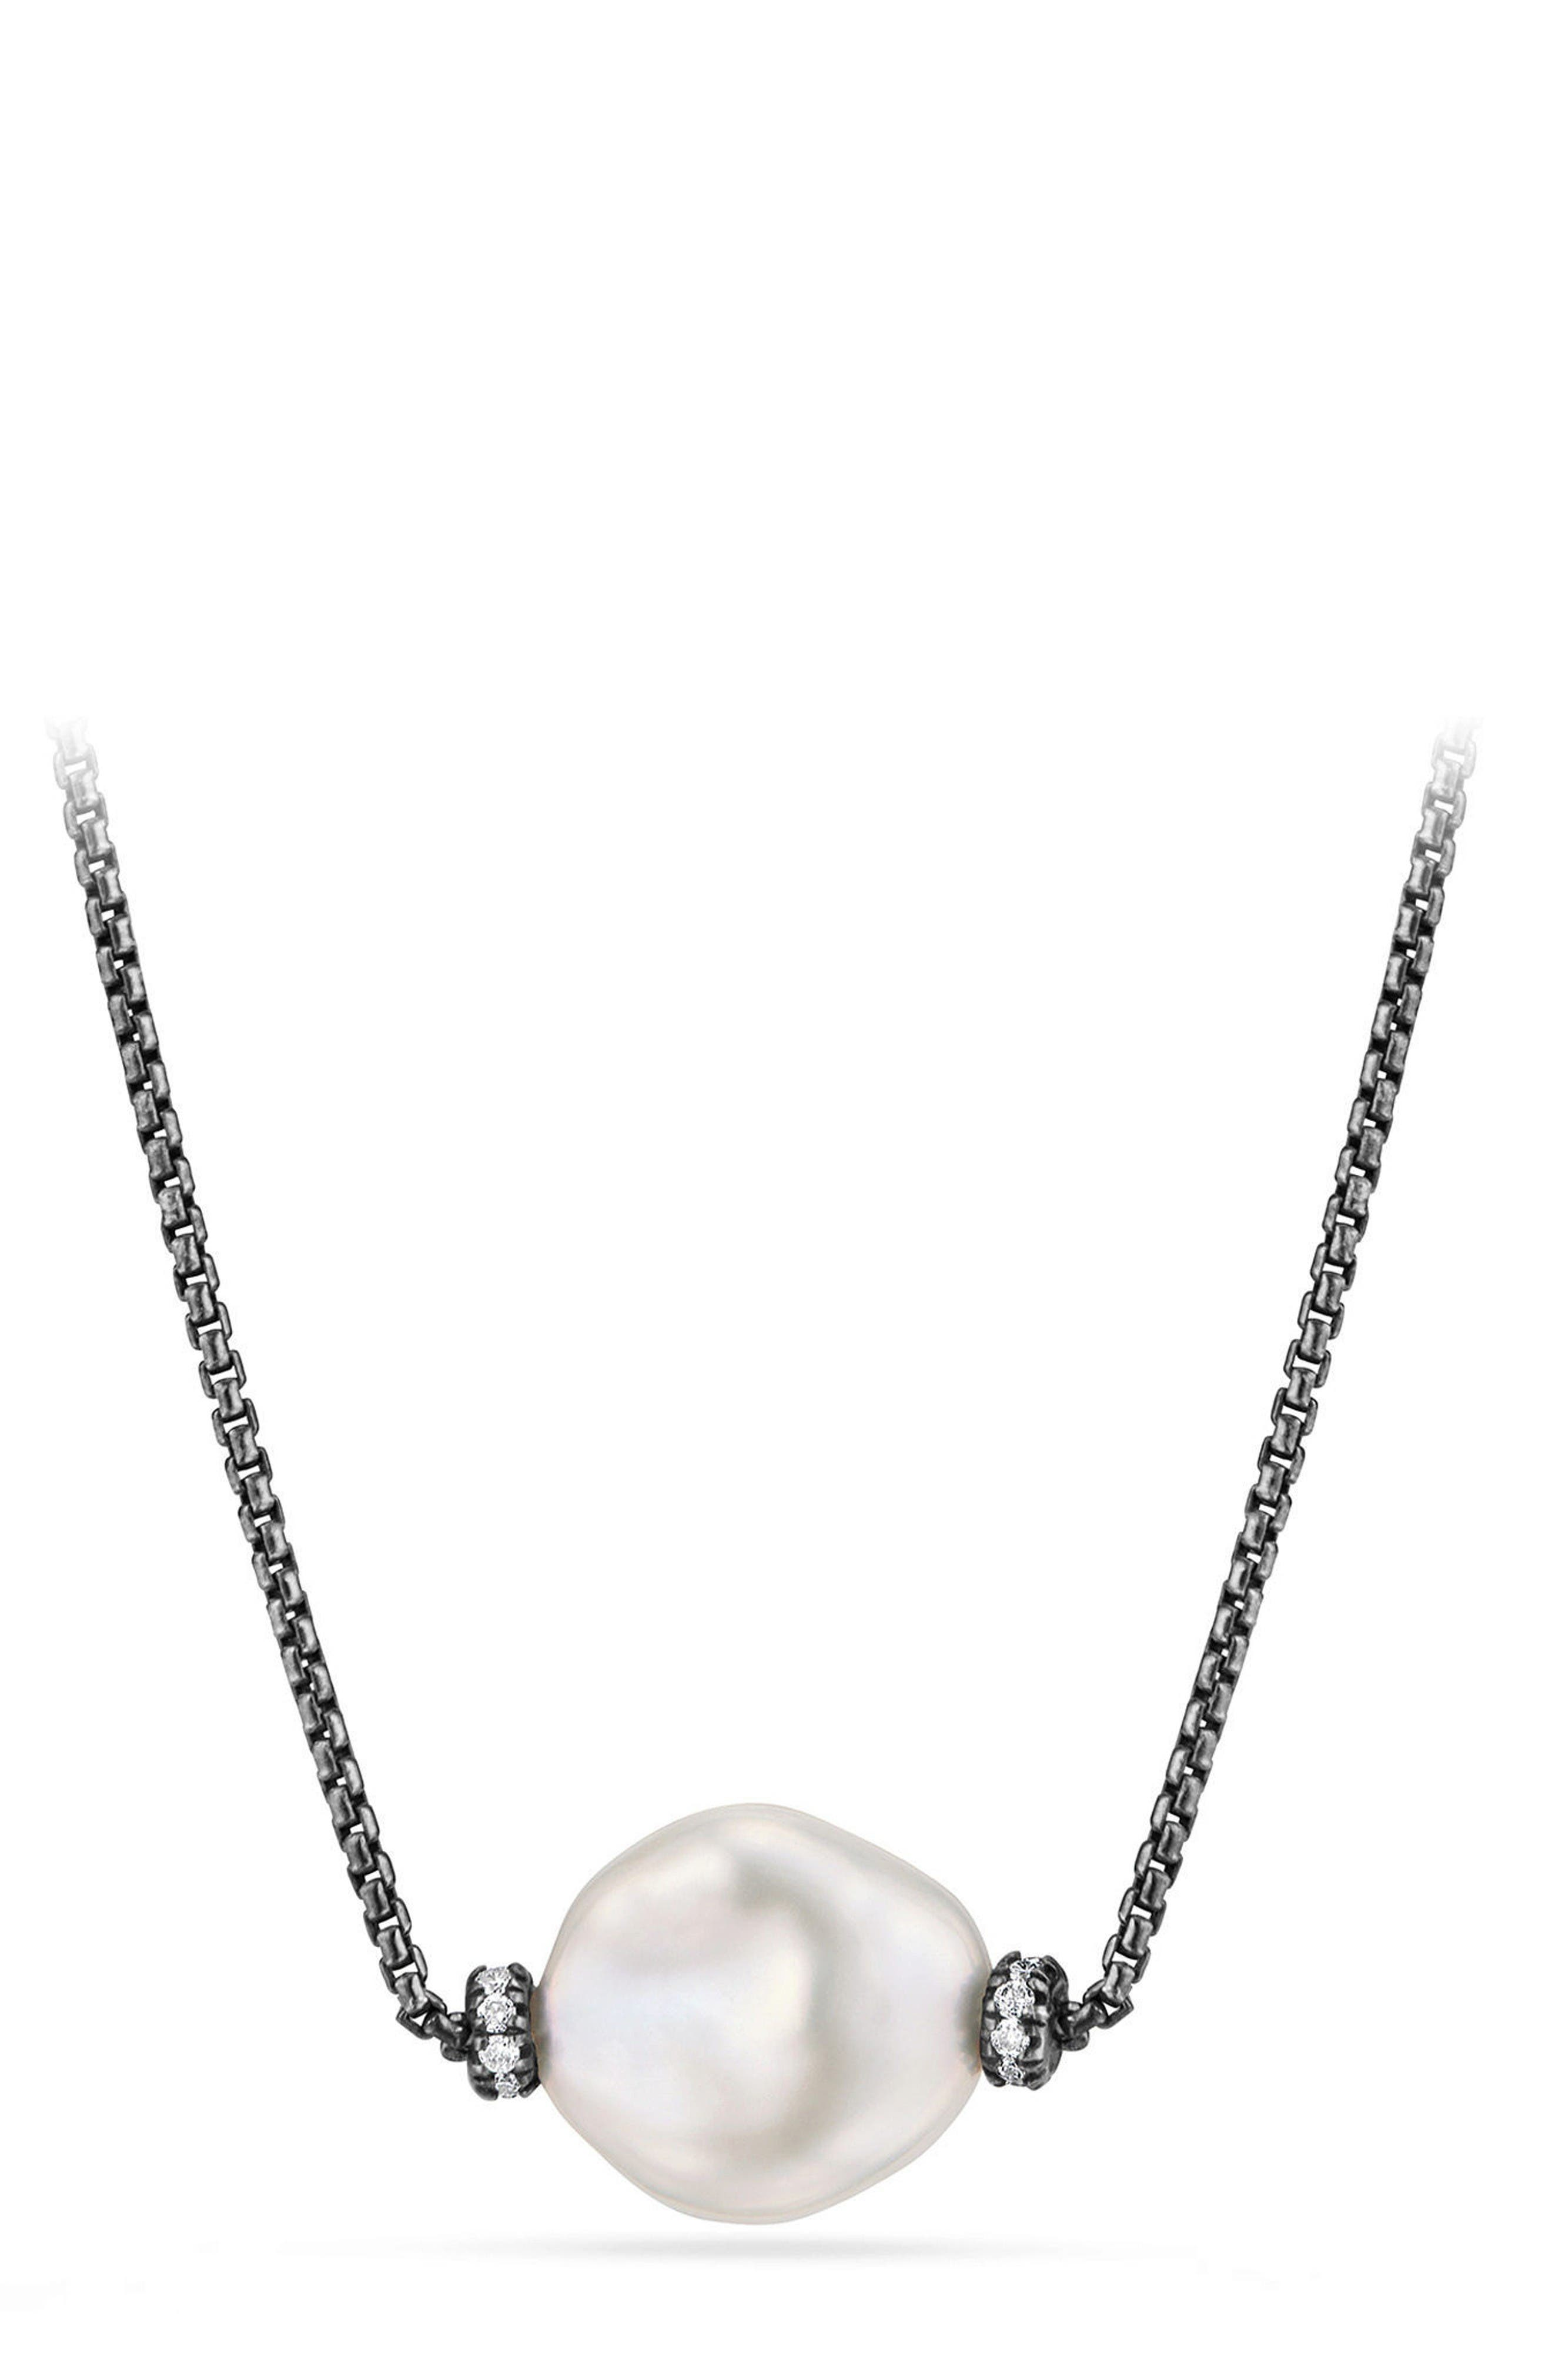 Main Image - David Yurman Solari Pearl & Diamond Station Necklace